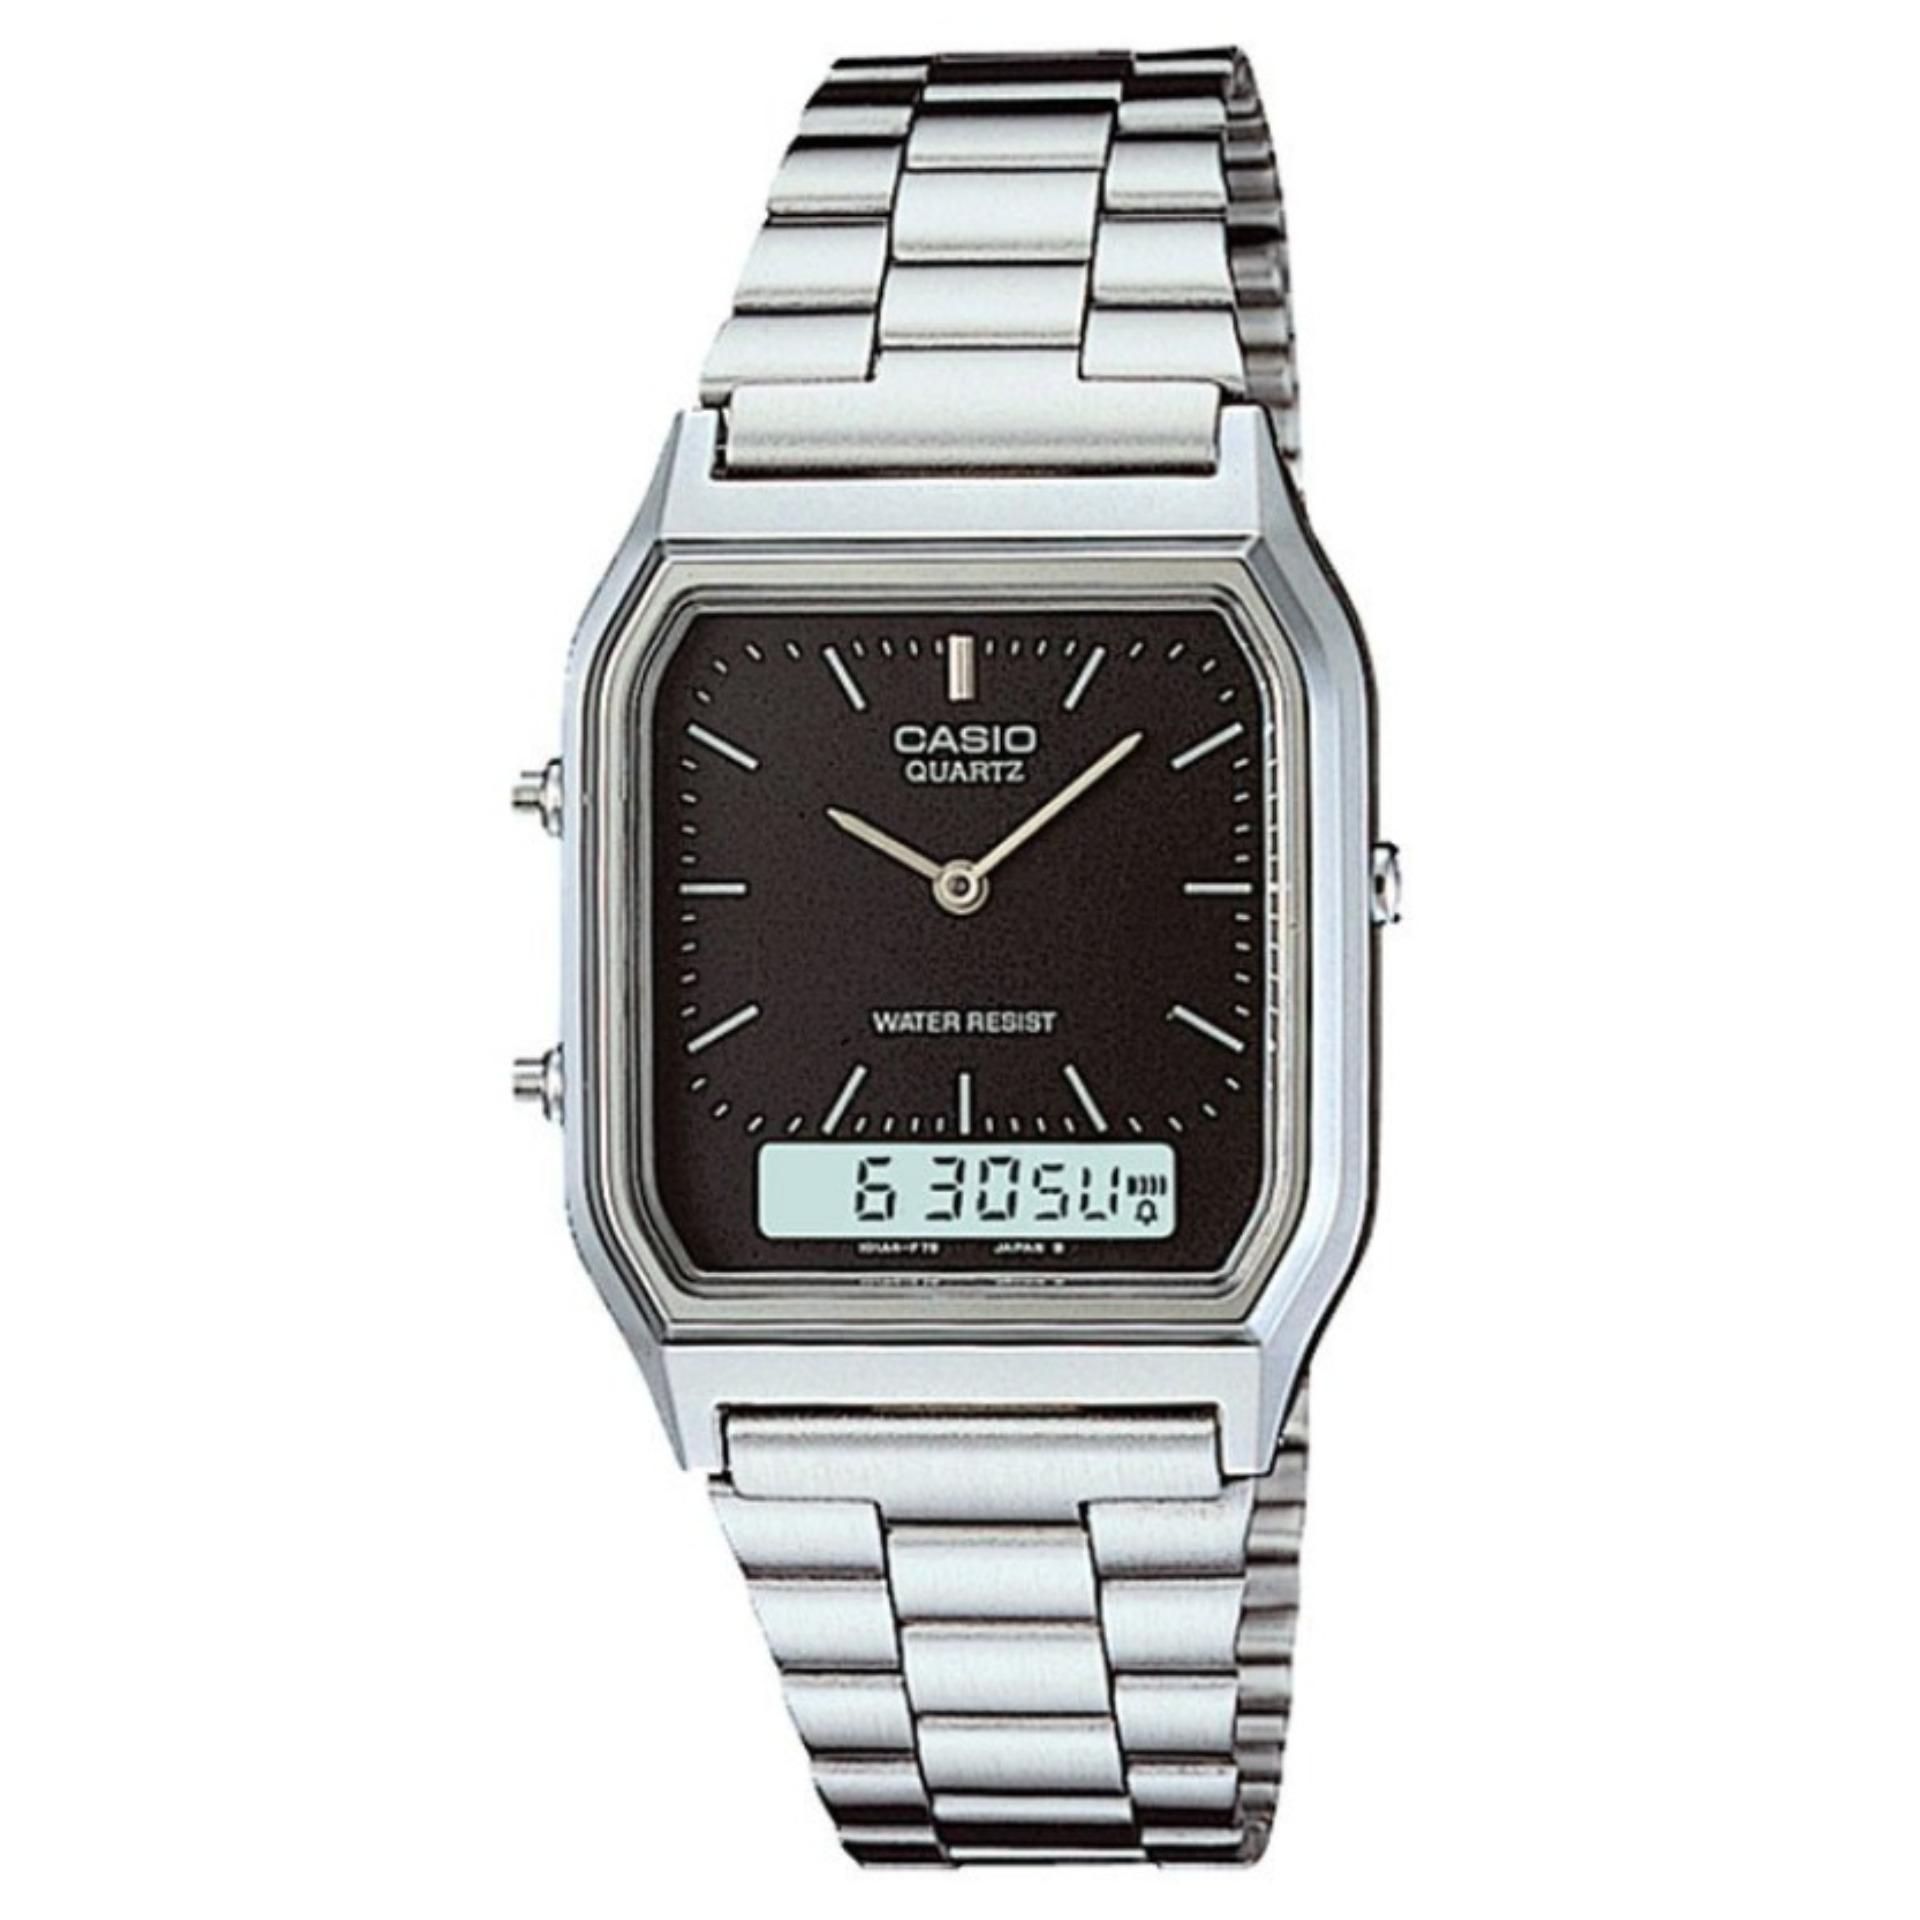 Casio Jam Tangan Pria Analog Mq 24 Geneva Qq 005 Black Emporio Armani Ar1828 Silver Flash Sale Standard Aq 230a